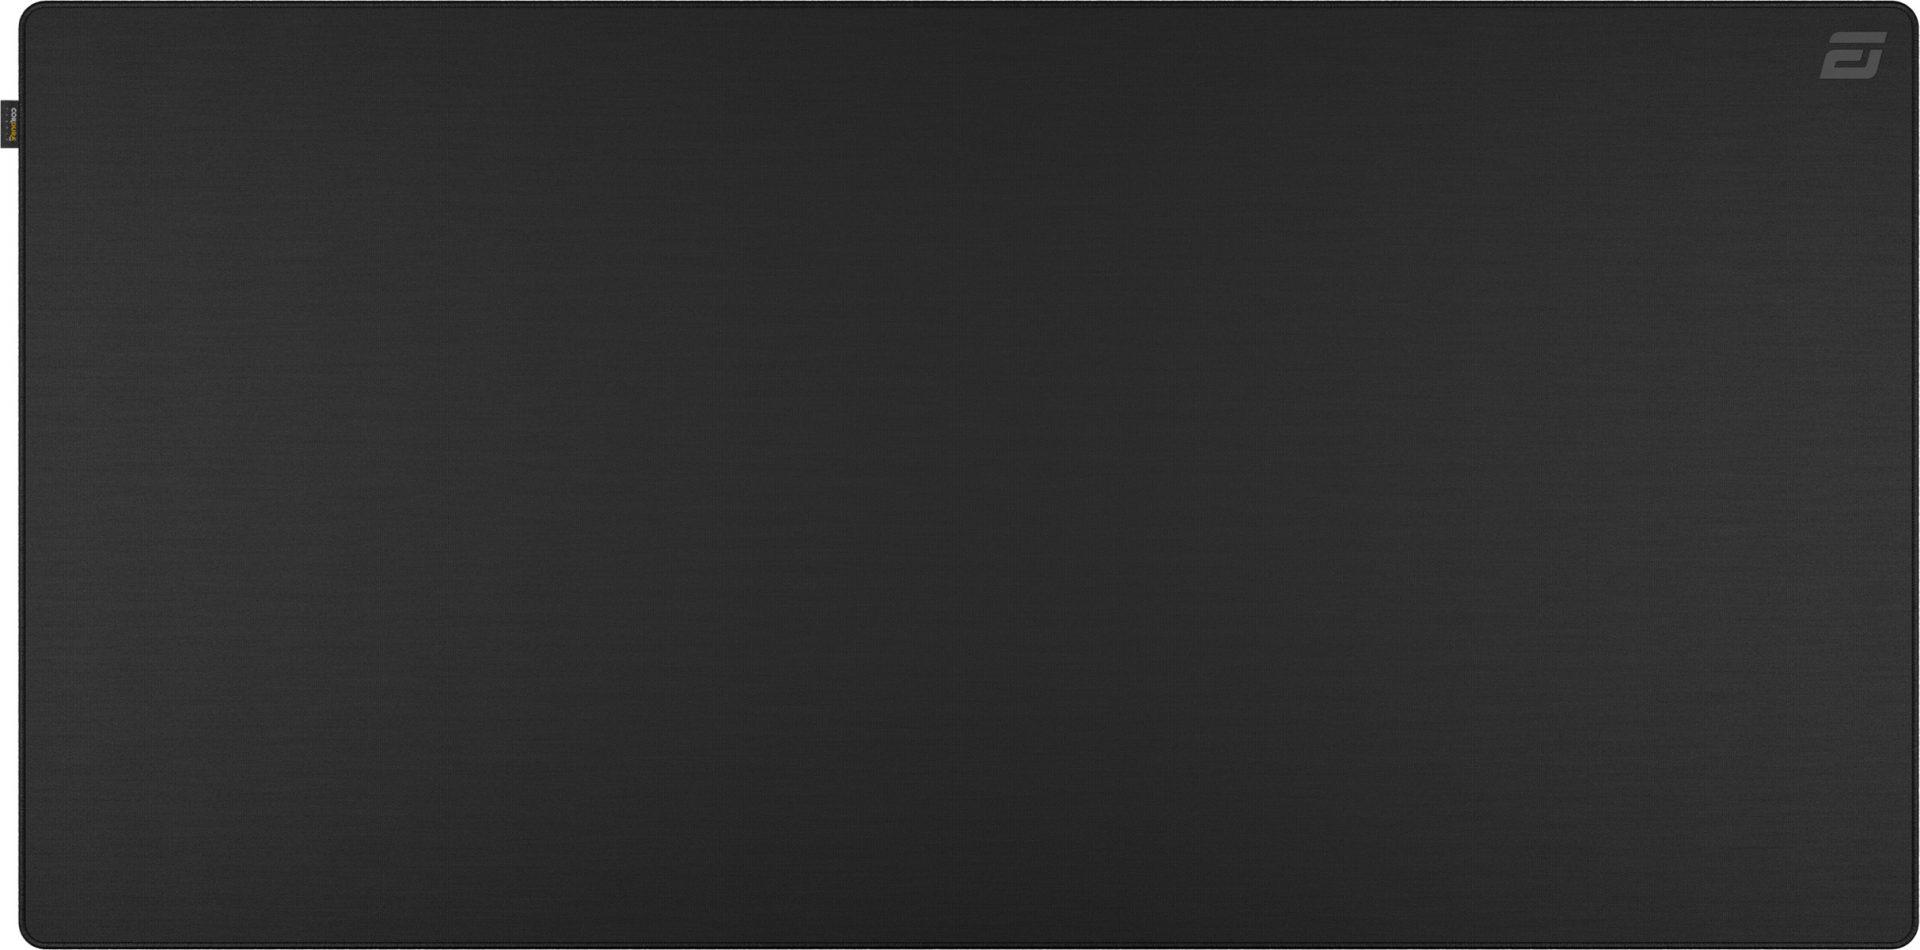 Endgame Gear MPC-1200 Cordura Gaming Mousepad - black - CASEKING 1.28.63.12.006